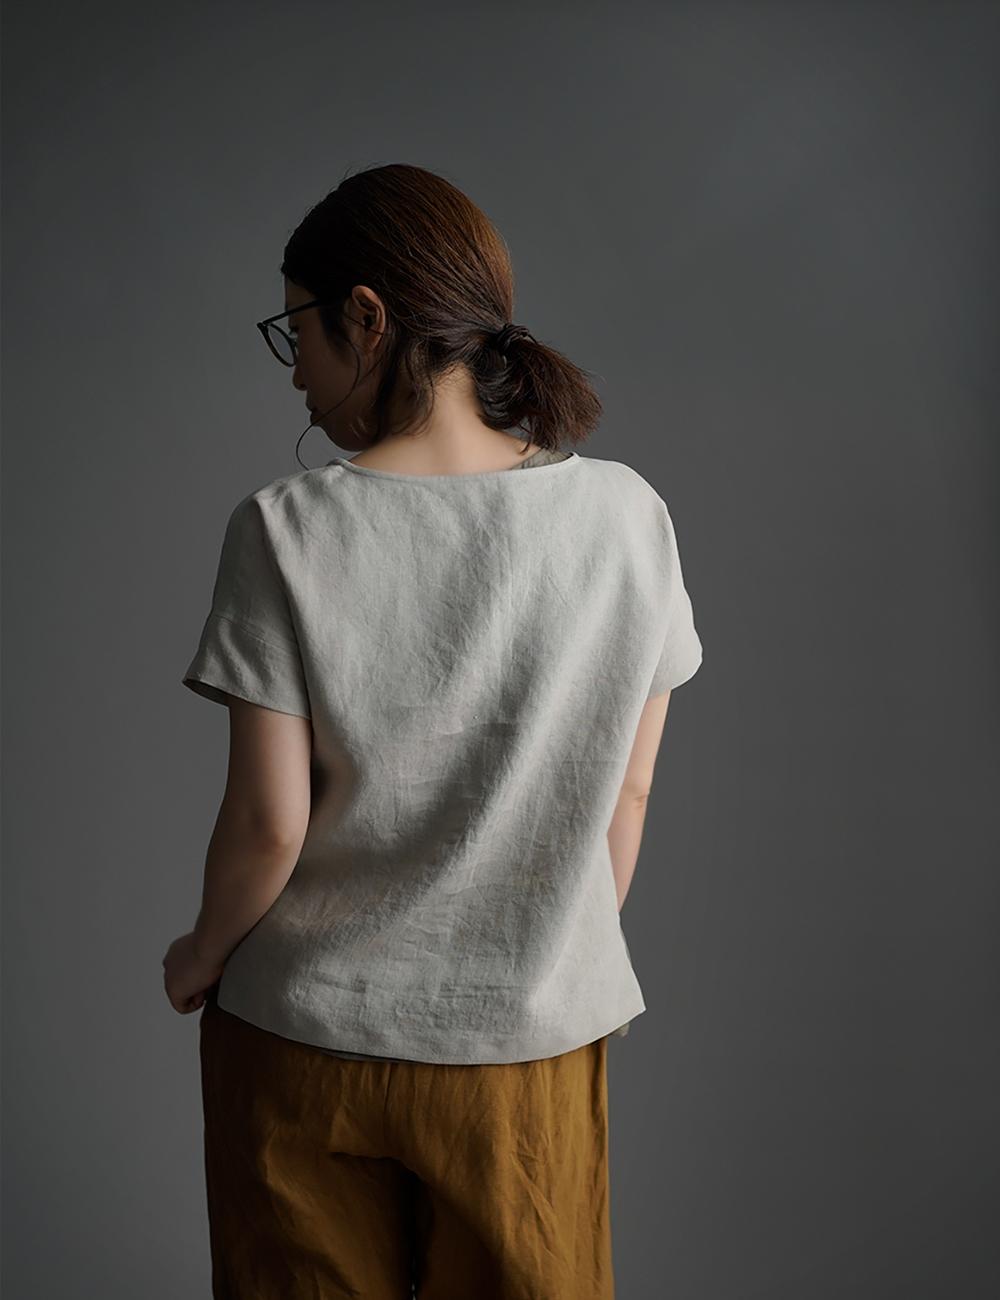 【wafu】Linen T-shirt ドロップショルダー Tシャツ /亜麻ナチュラル t001l-amn1